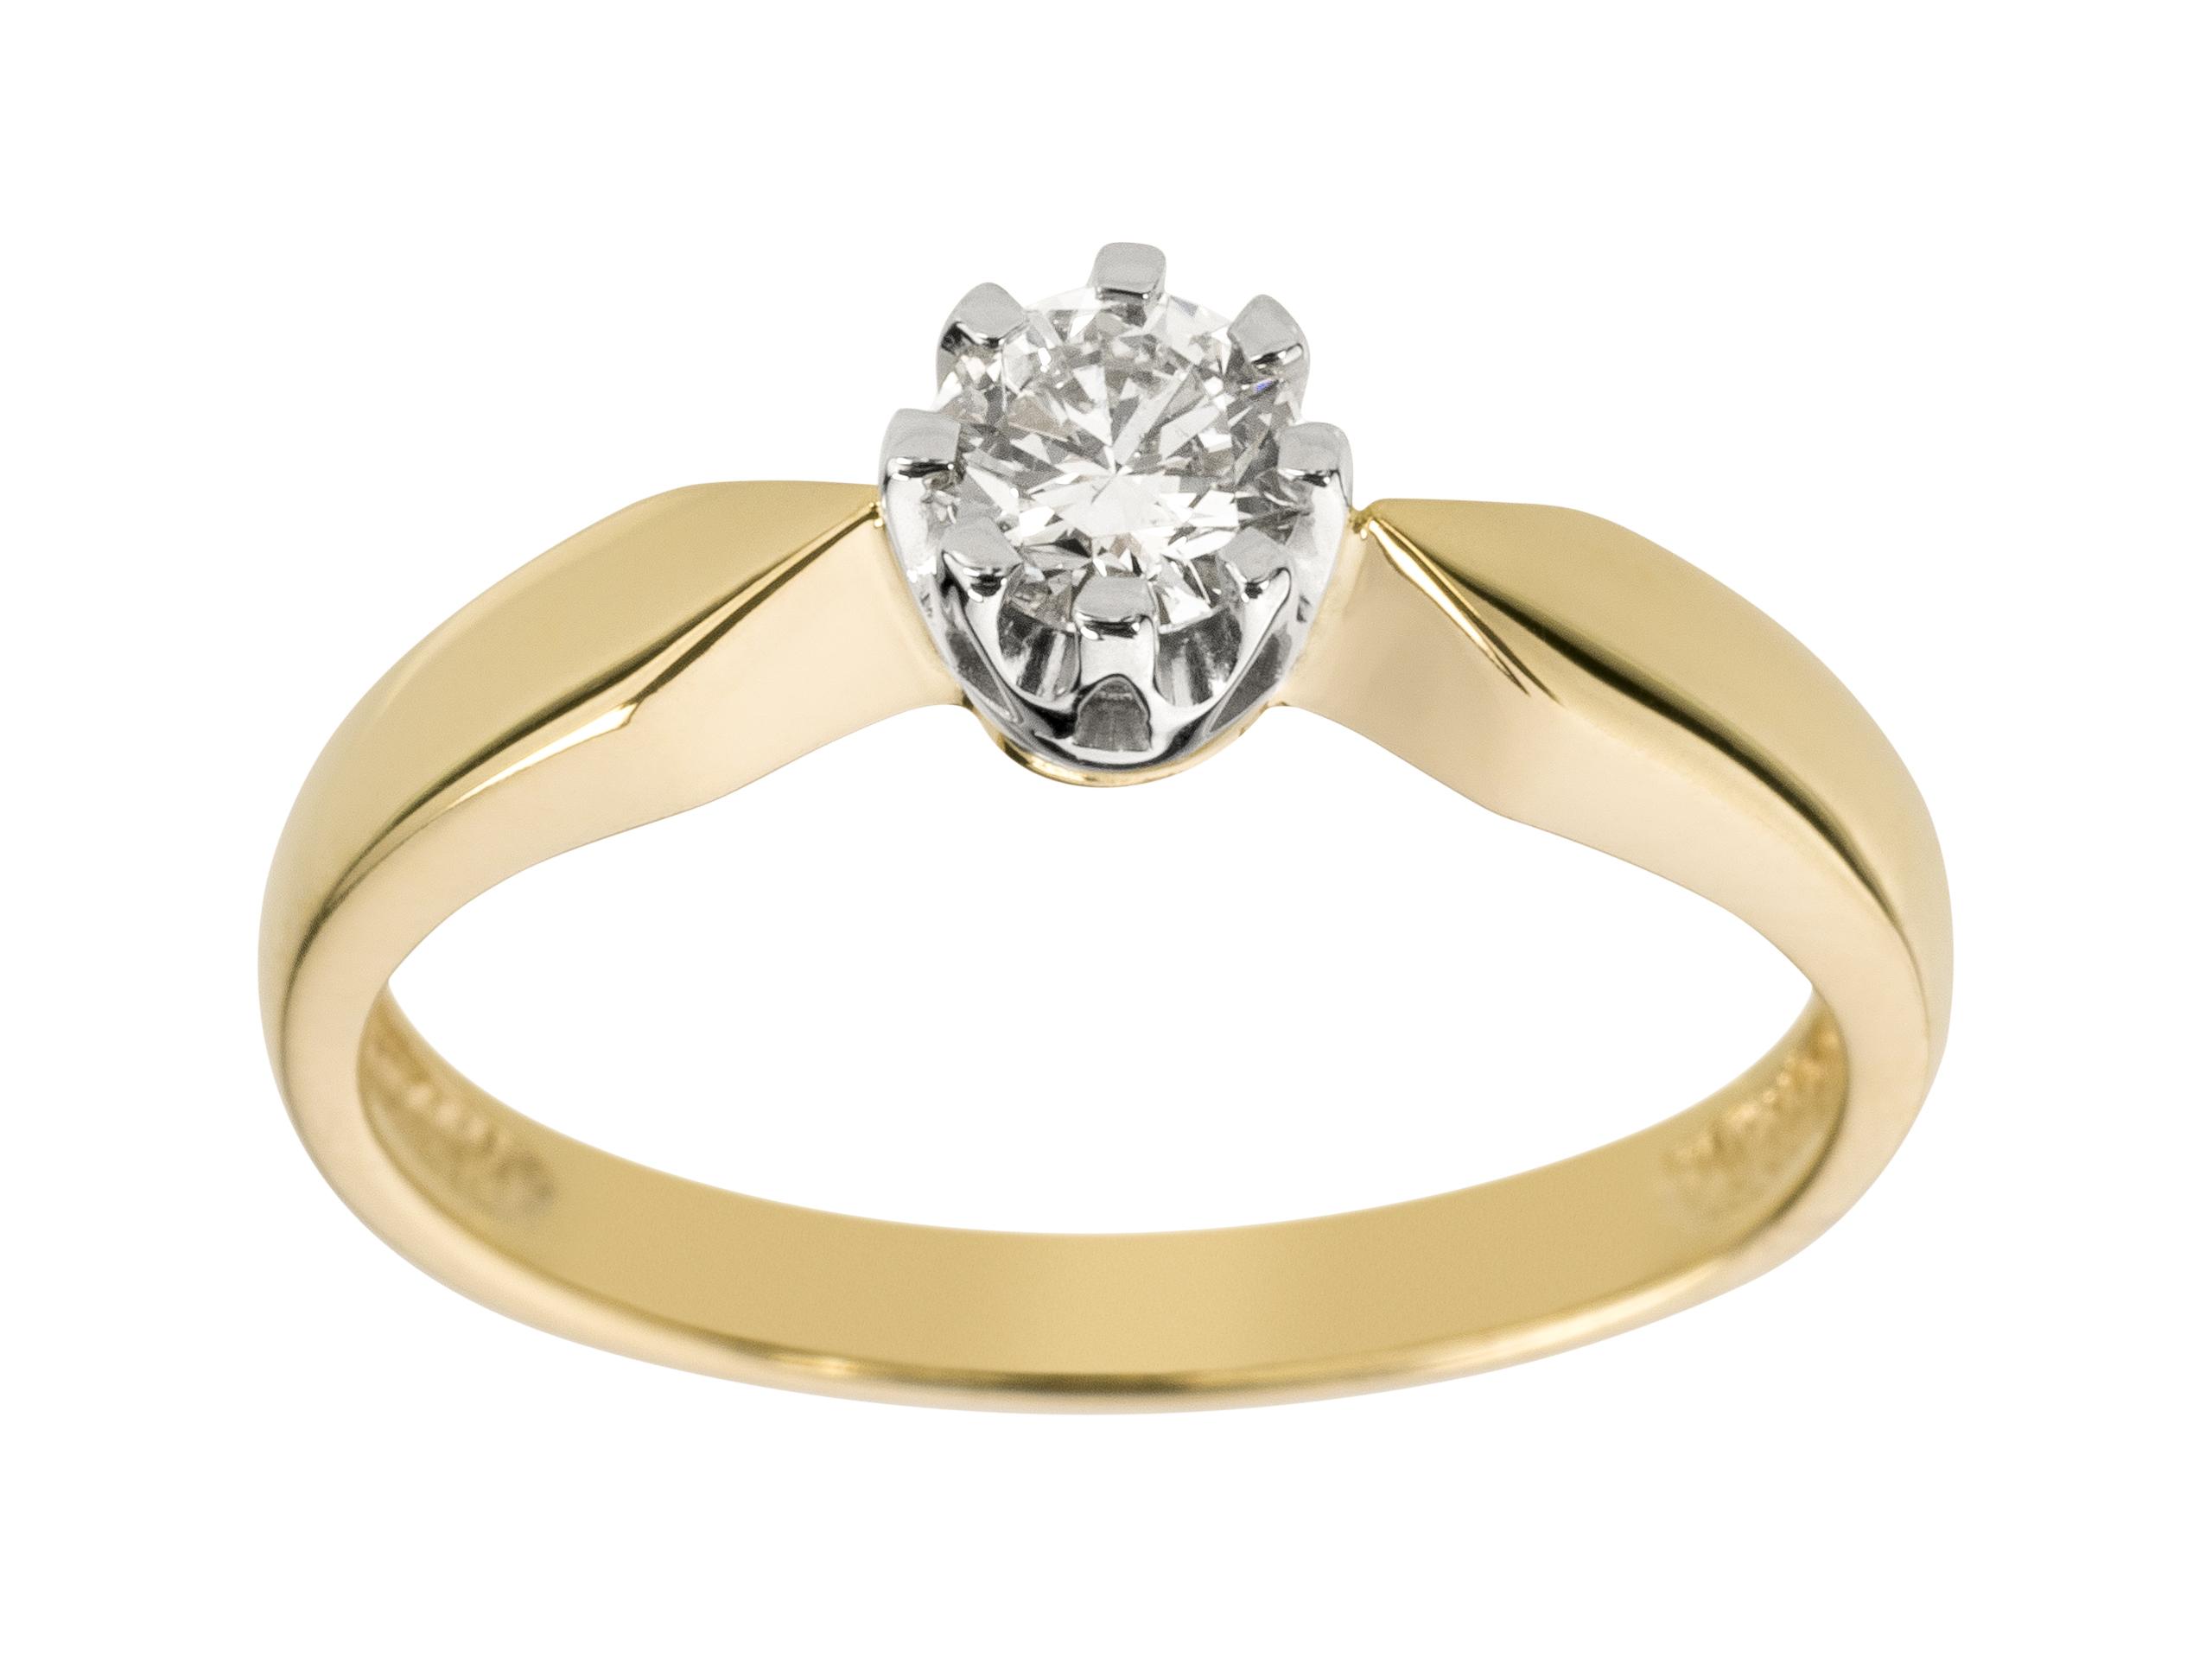 CLASSIC GOLD DIAMOND RING 0.24 ct